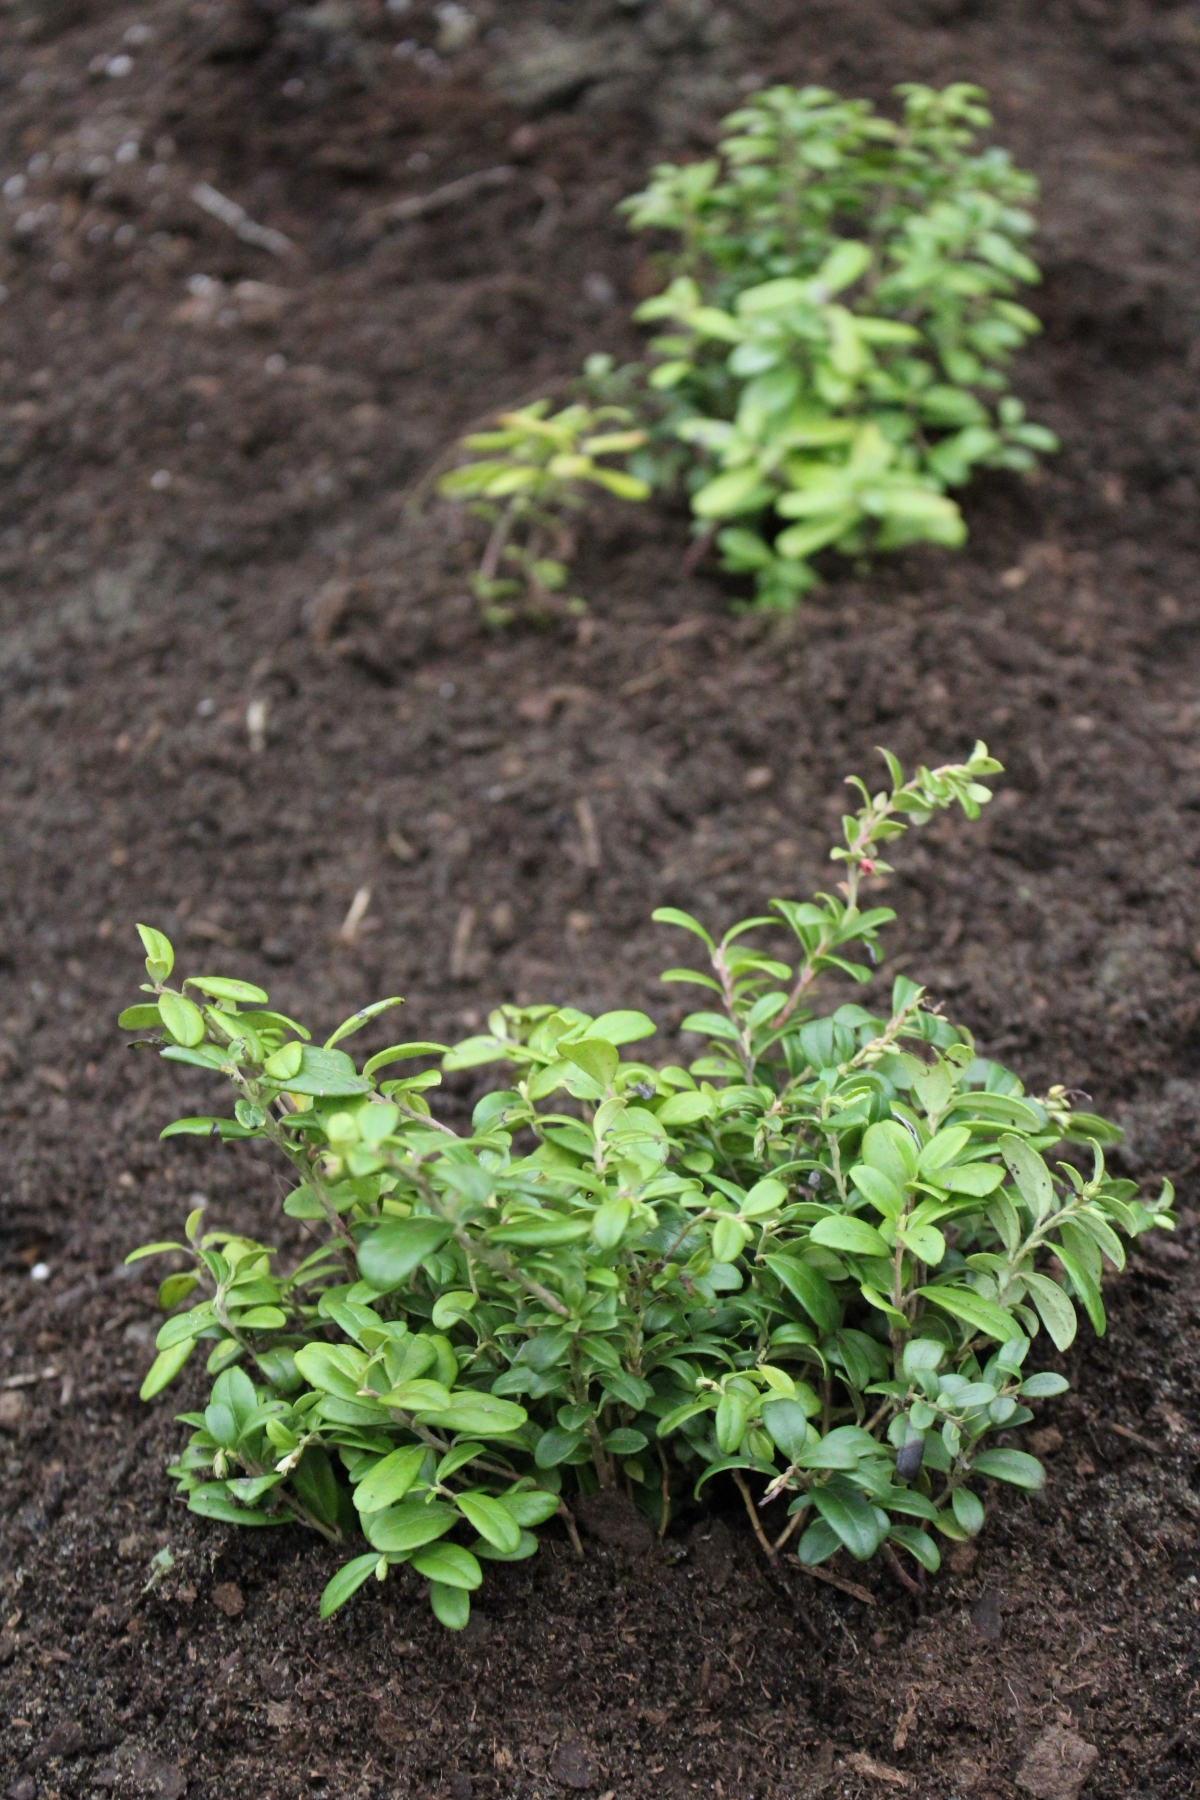 Planting Lingonberries